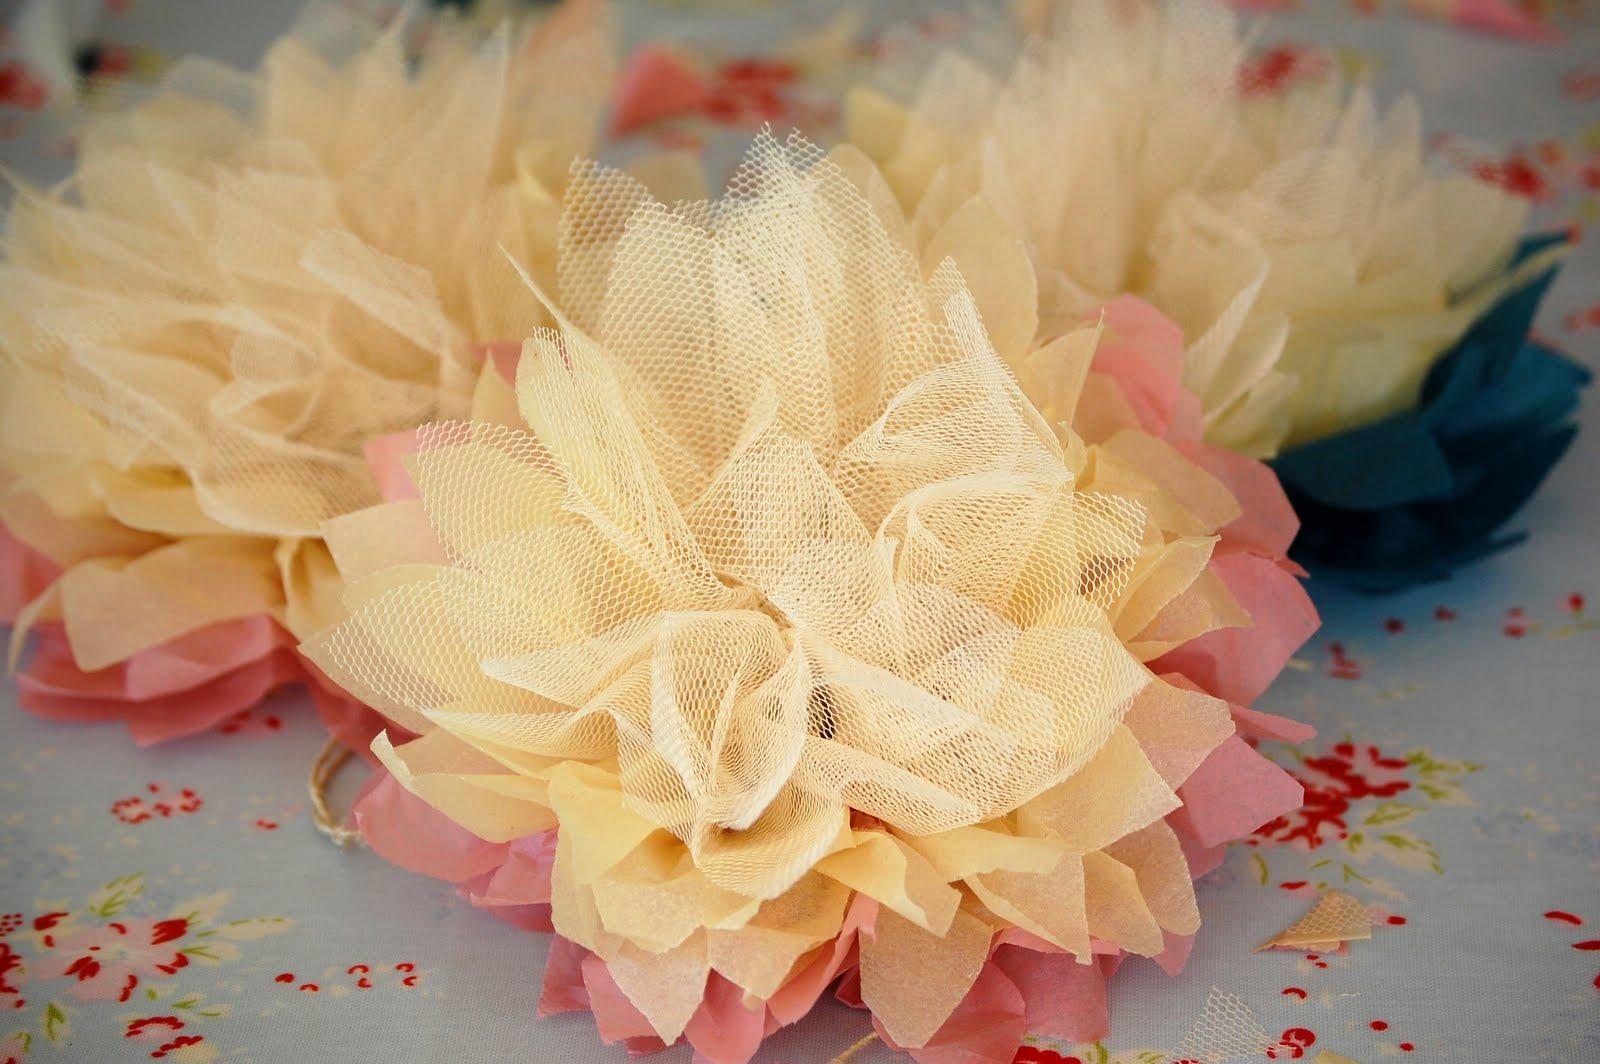 como fazer pompom papel de seda tule decoracao festa aniversario batizado casamento cha de bebe (1)